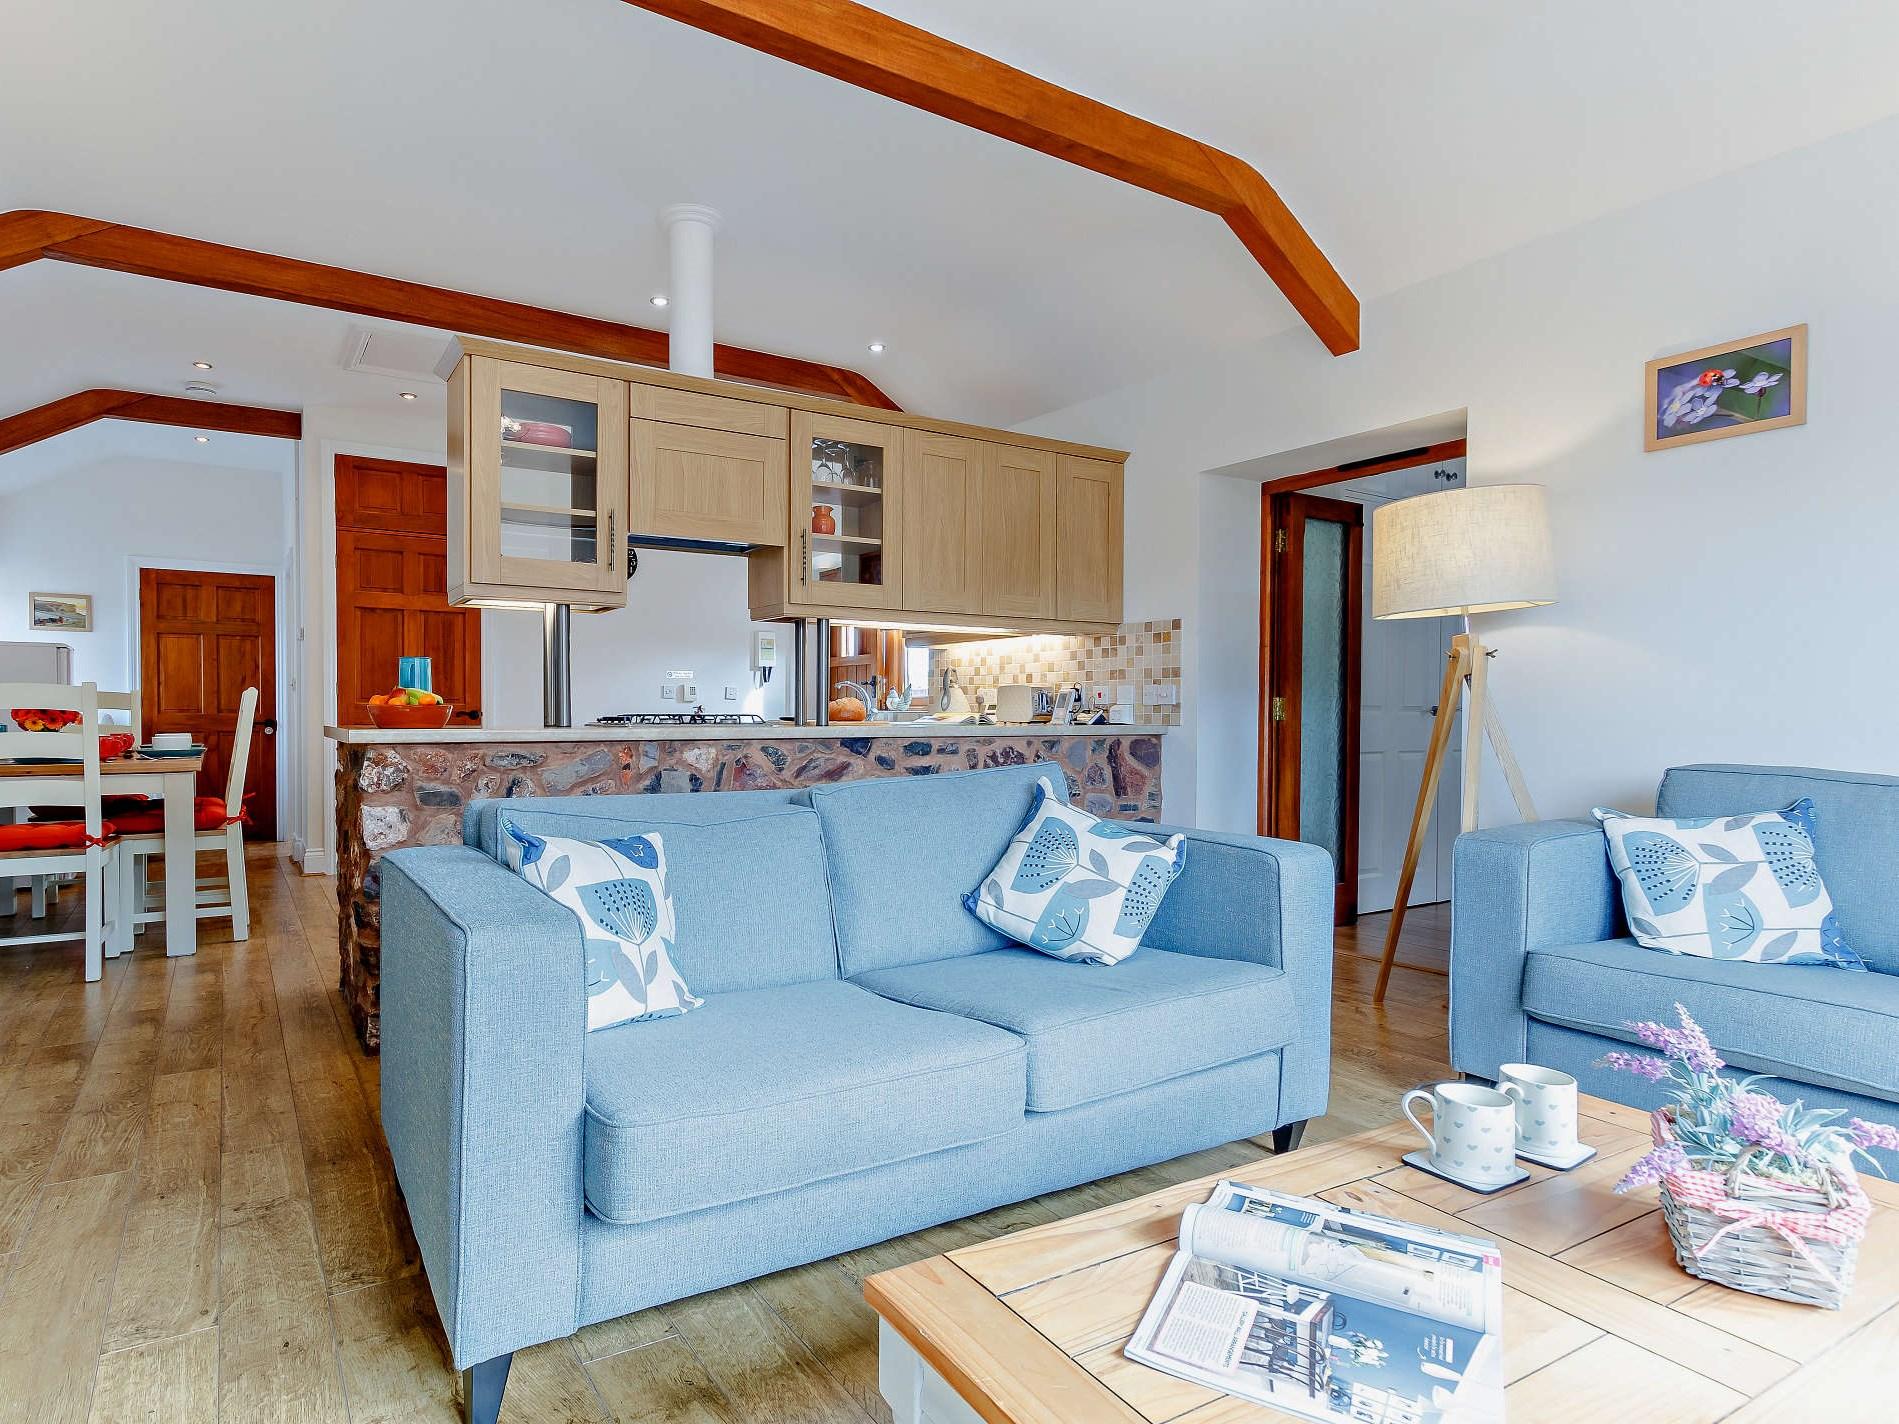 2 Bedroom Cottage in Wellington, Dorset and Somerset